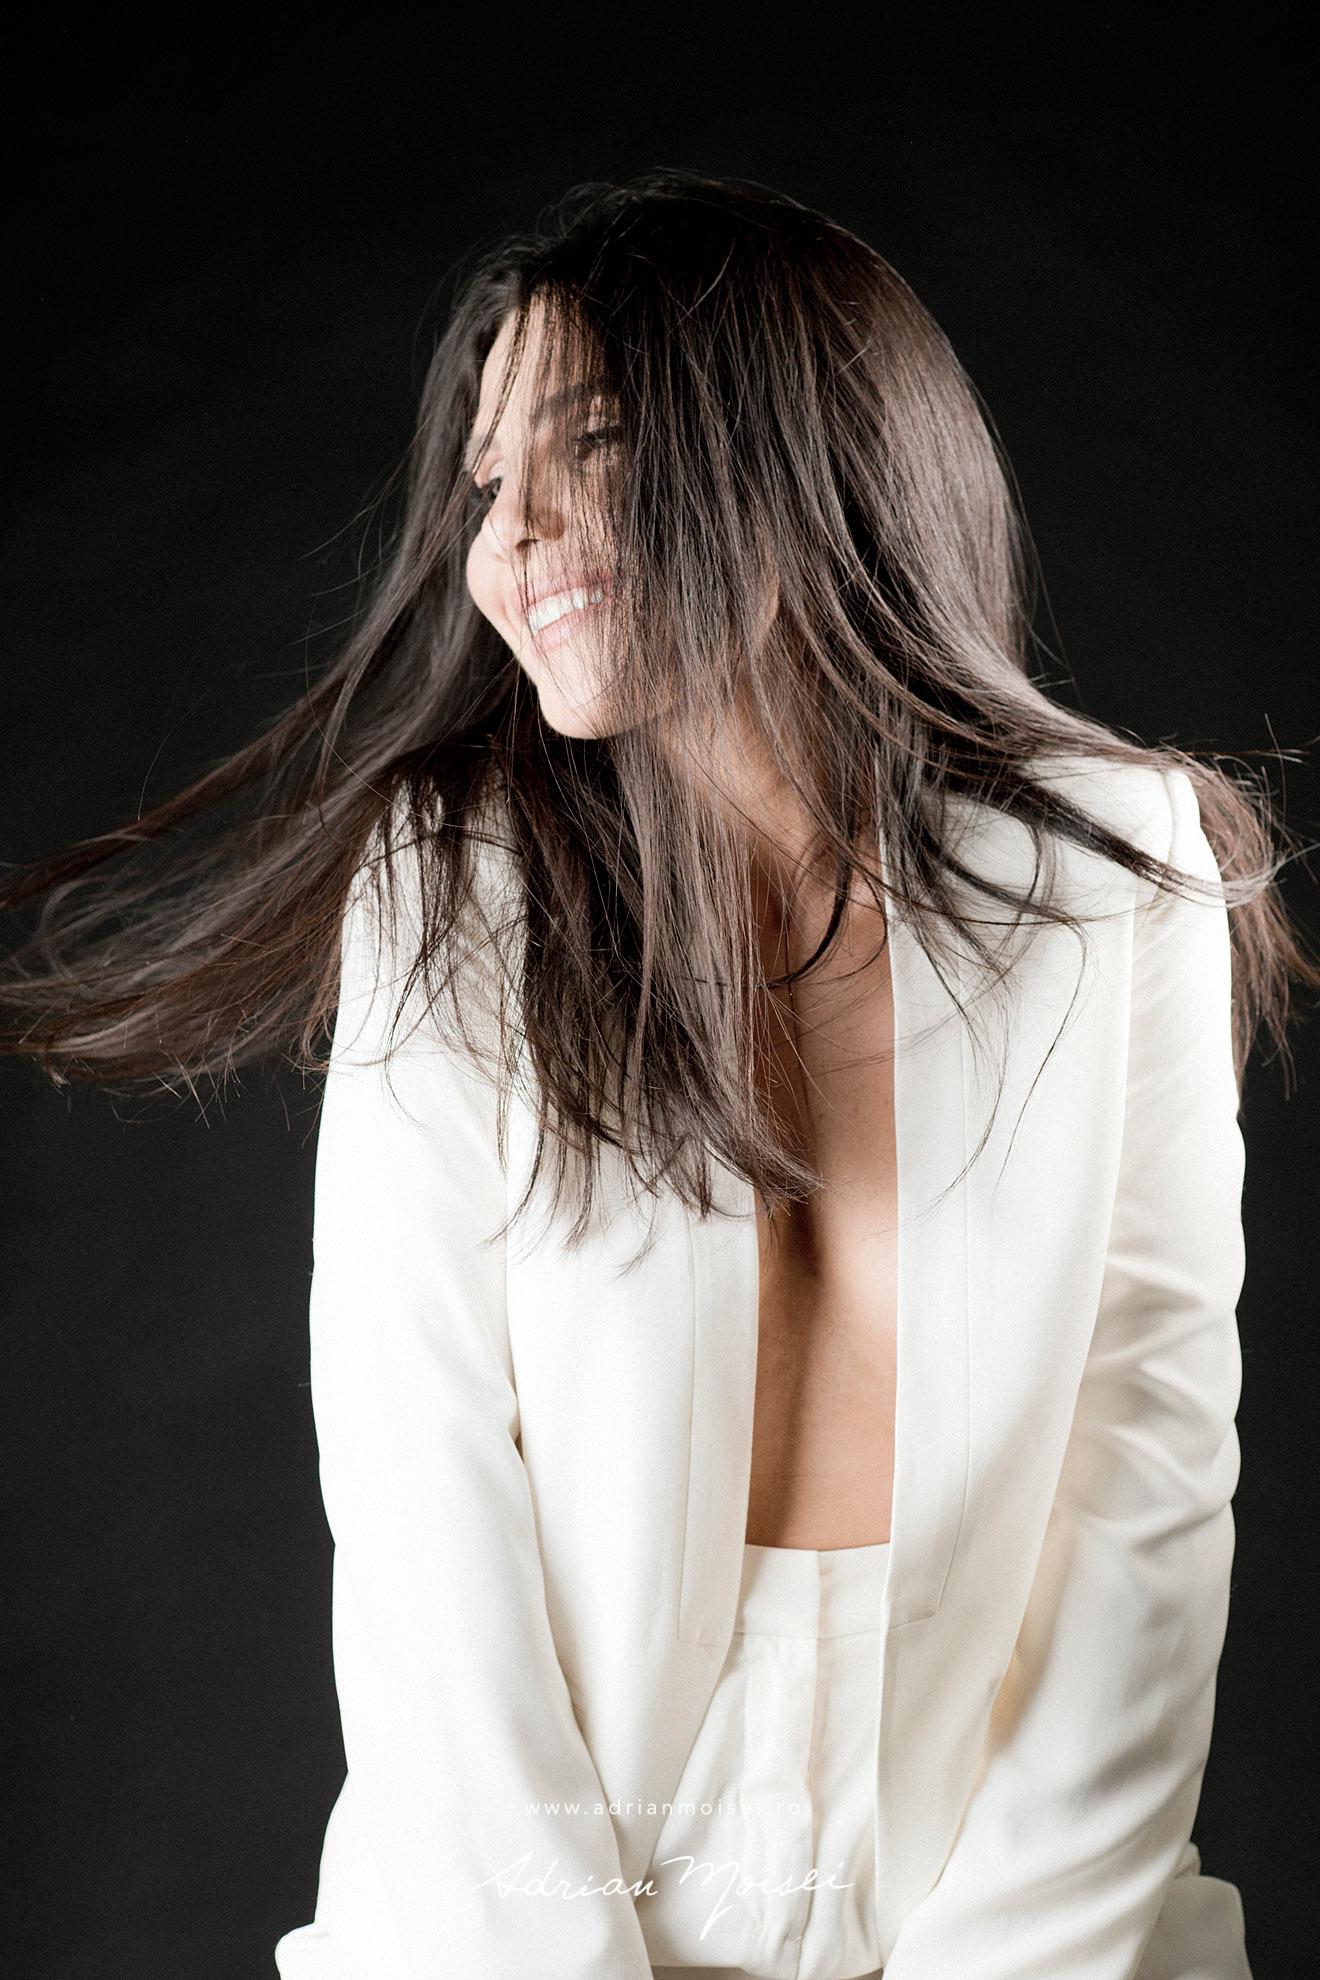 Fotograf fashion Iasi - cu modela frumoasa si senzuala in studio, pe fundal negru - foto Adrian Moisei